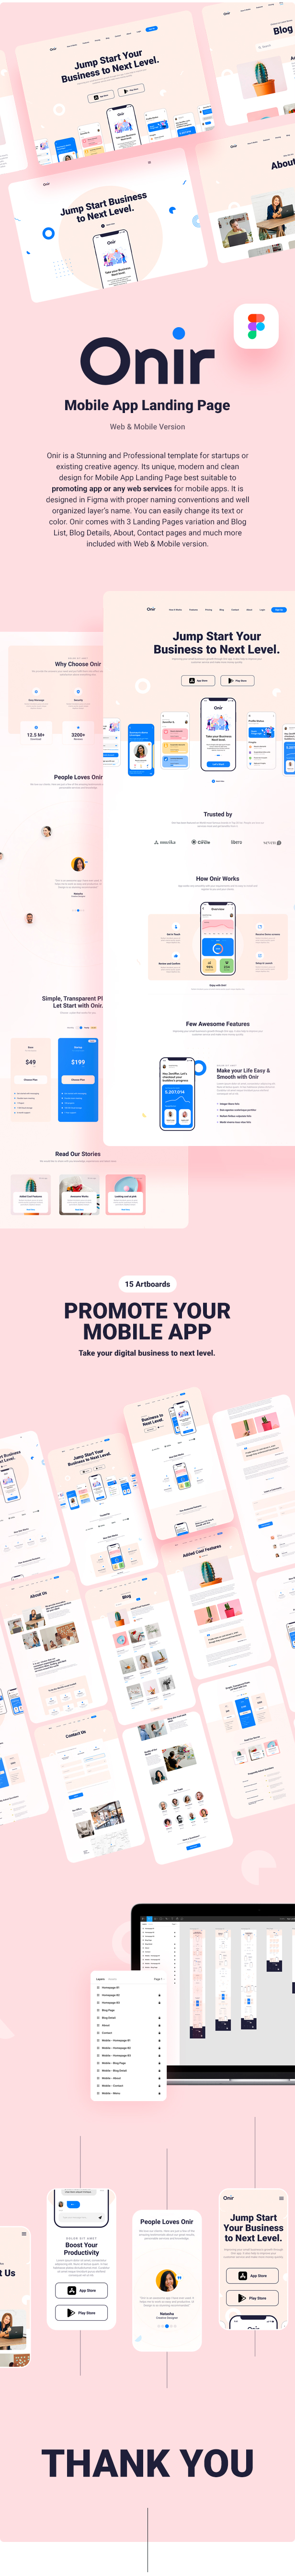 Onir - Mobile App Landing Page Figma Template - 1